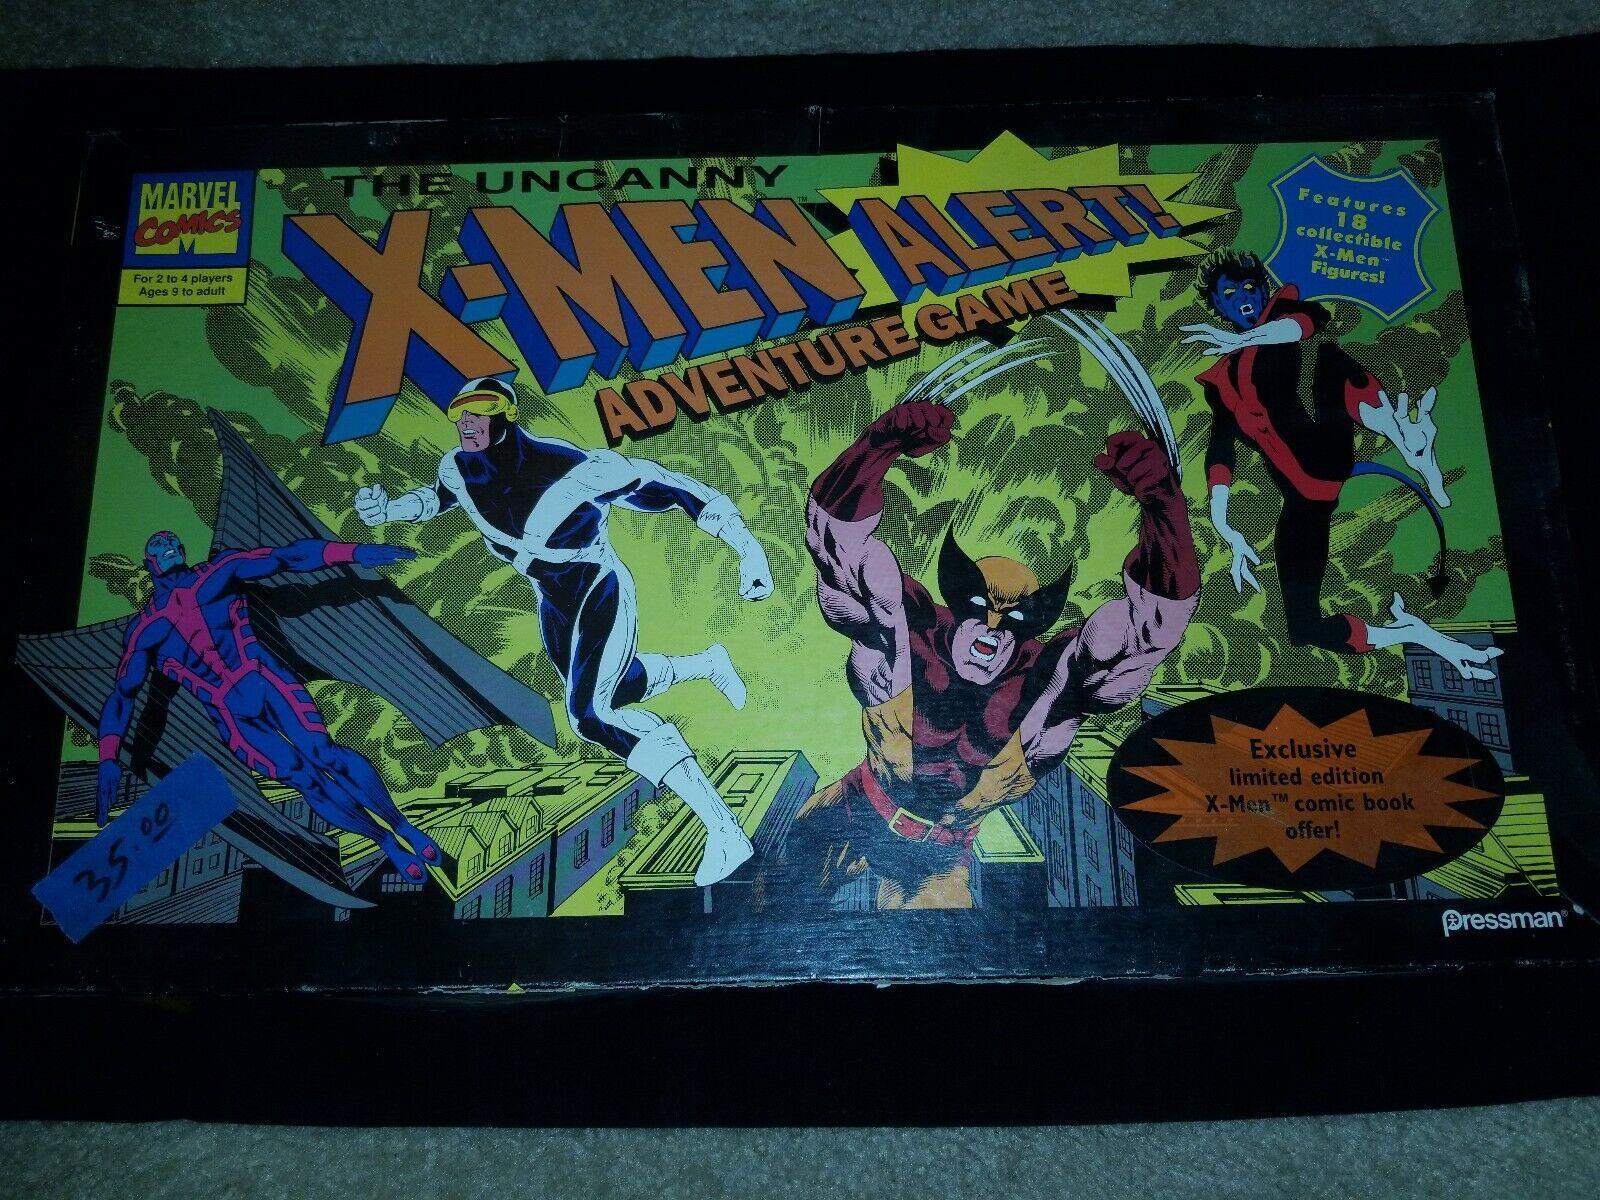 Adventure Game Replacement Parts Cards /& Figures 1992 The Uncanny X-Men Alert